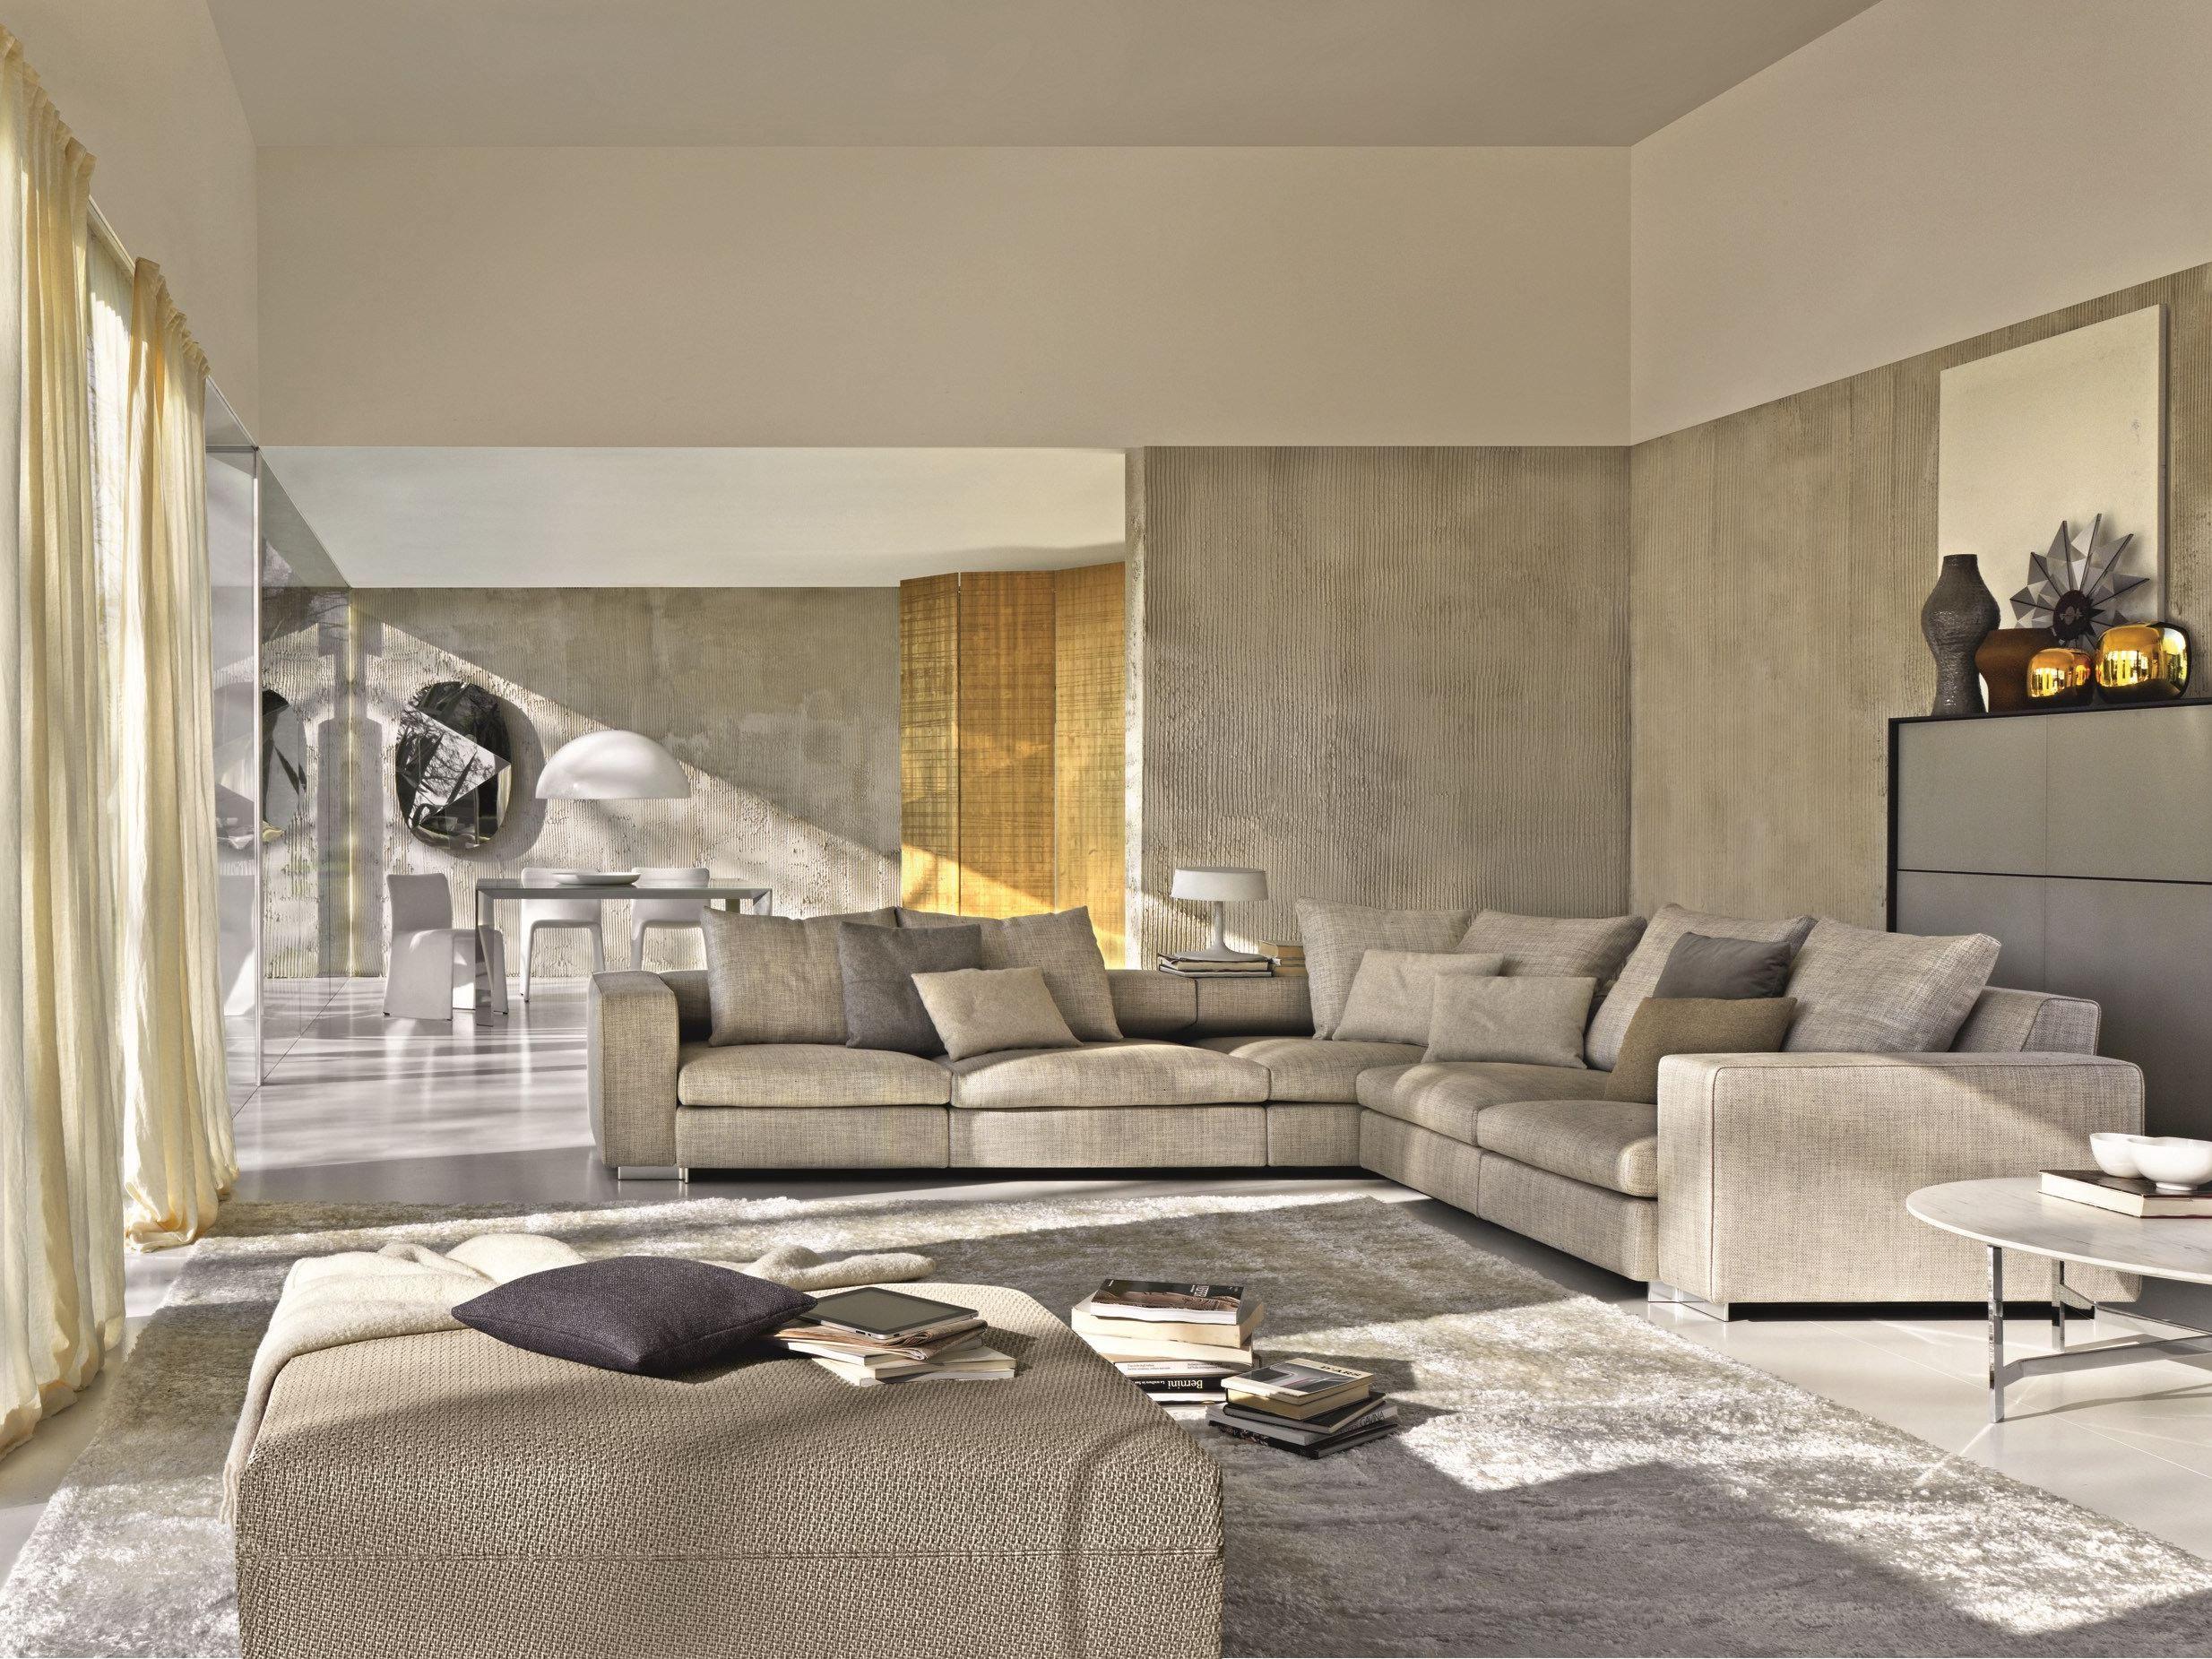 Corner sectional fabric sofa TURNER